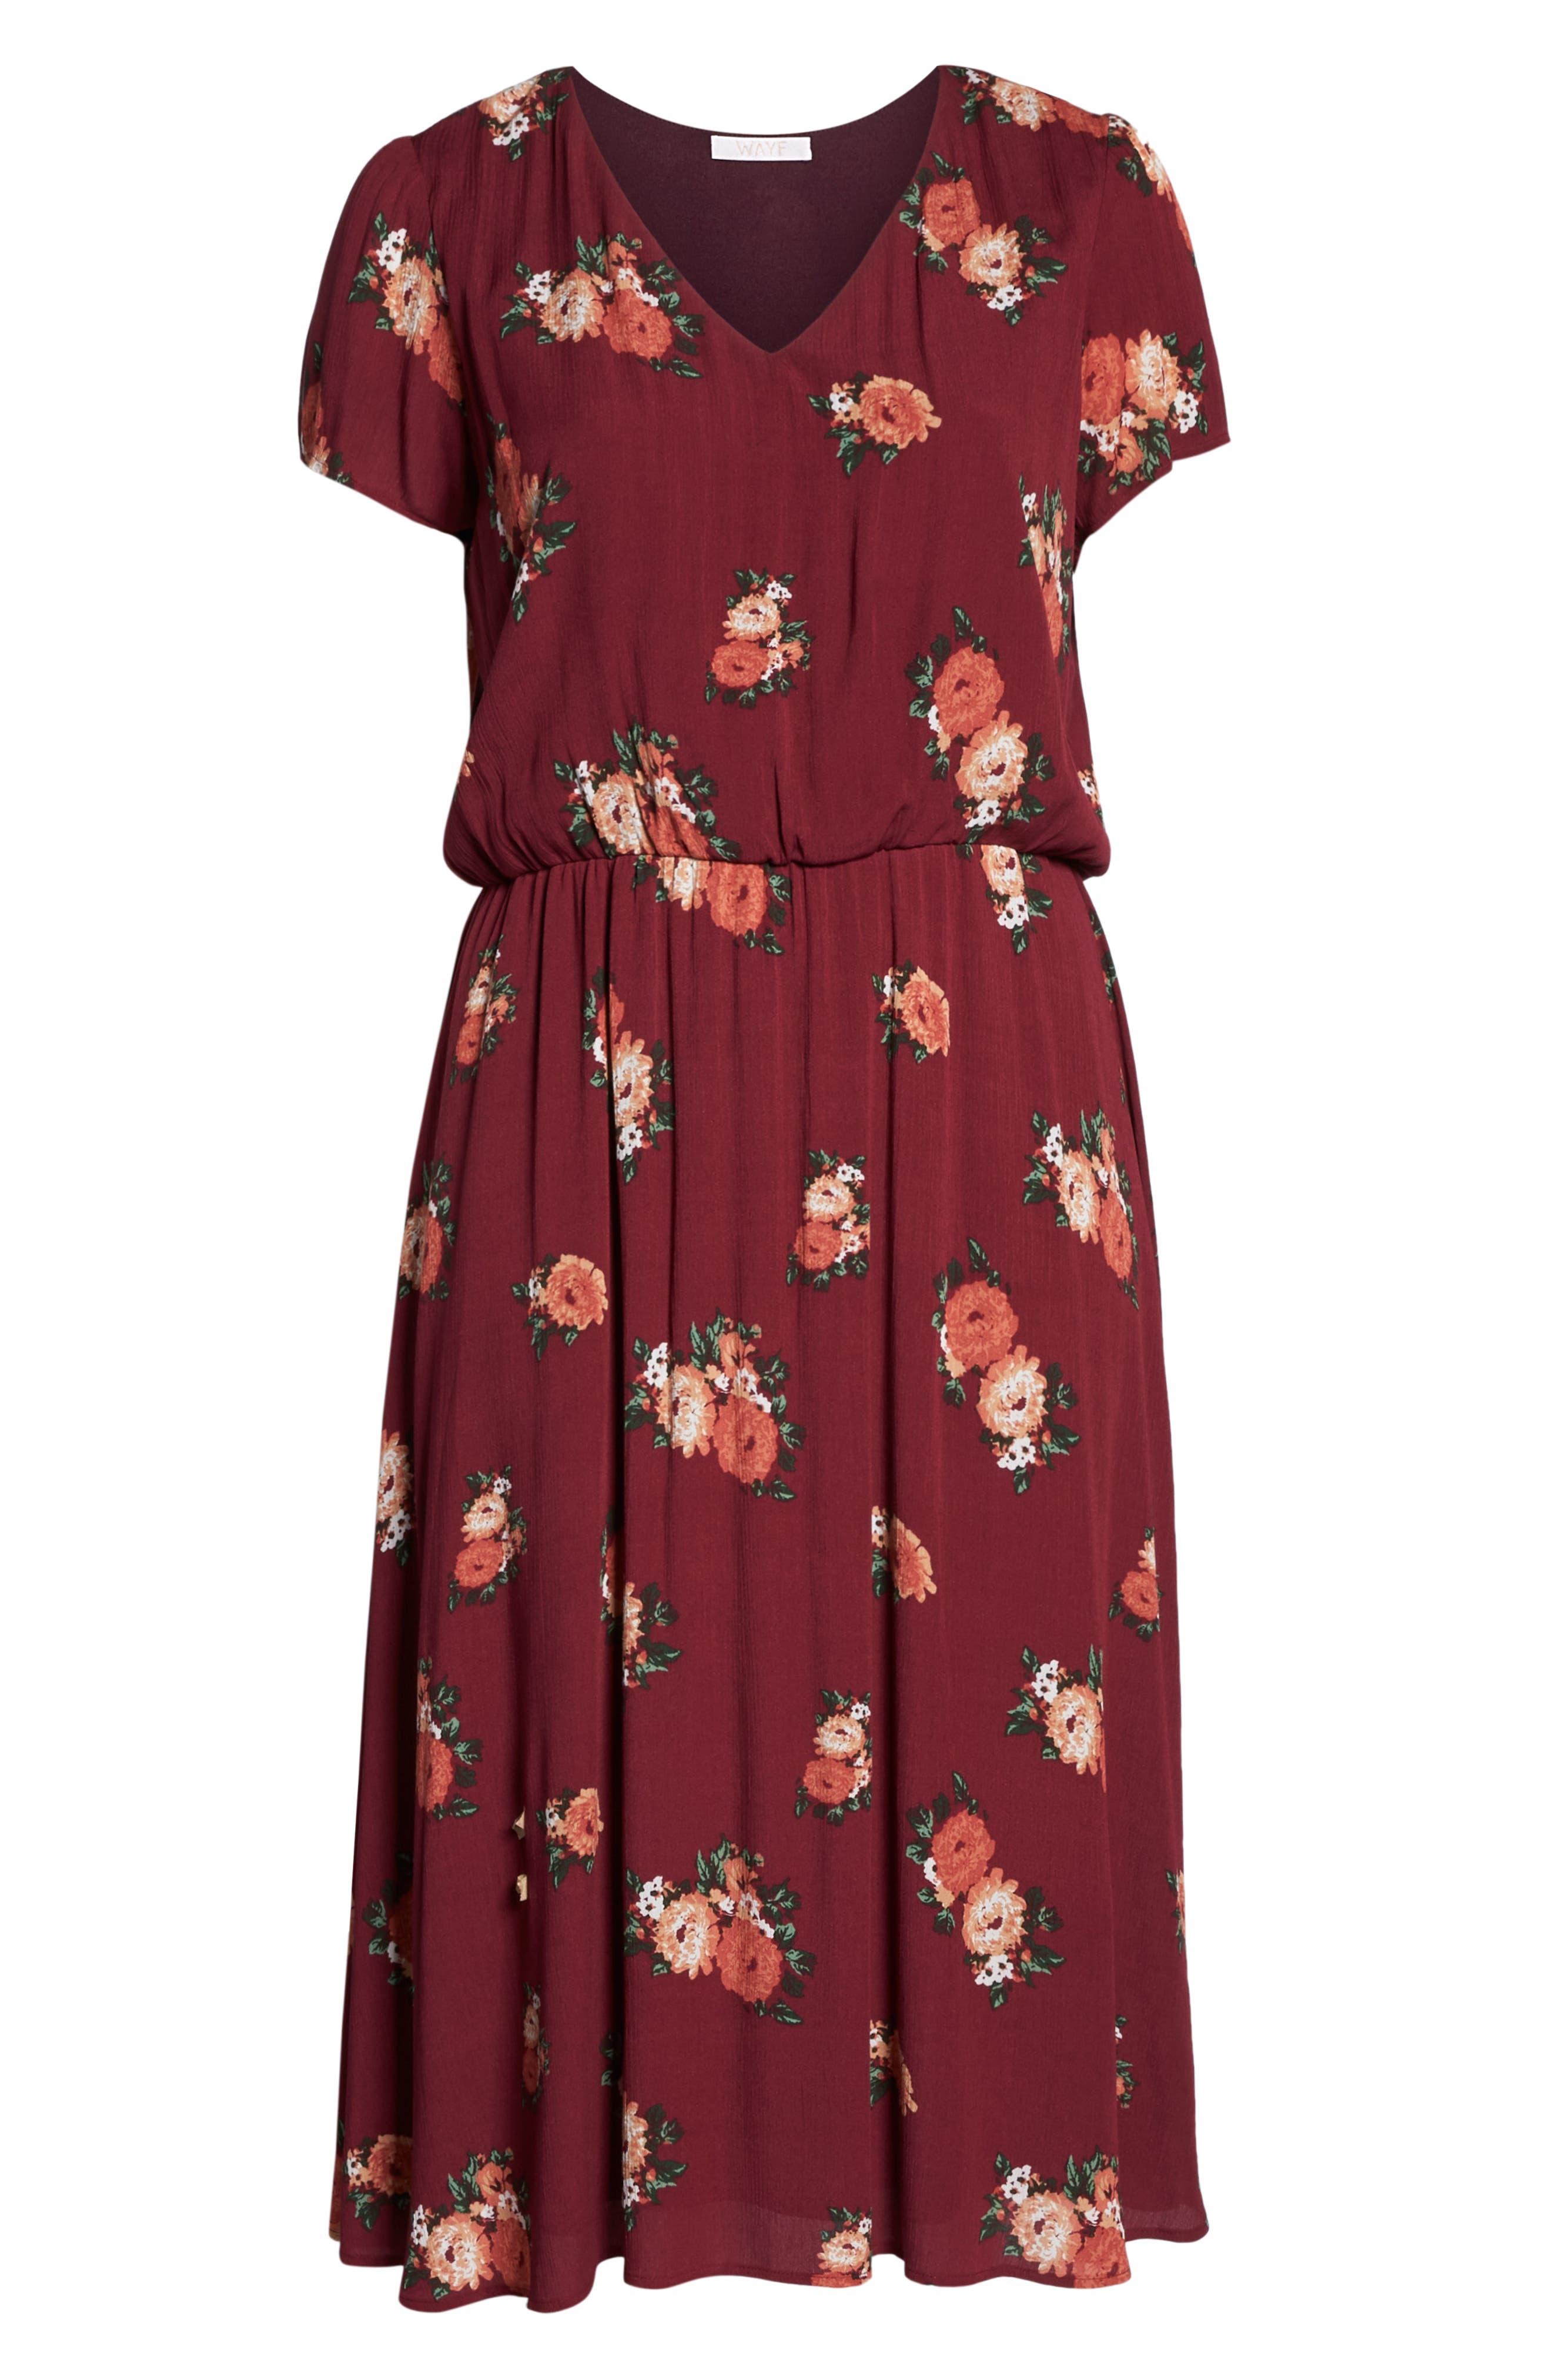 Blouson Midi Dress,                             Alternate thumbnail 7, color,                             RED RUMBA FLORAL